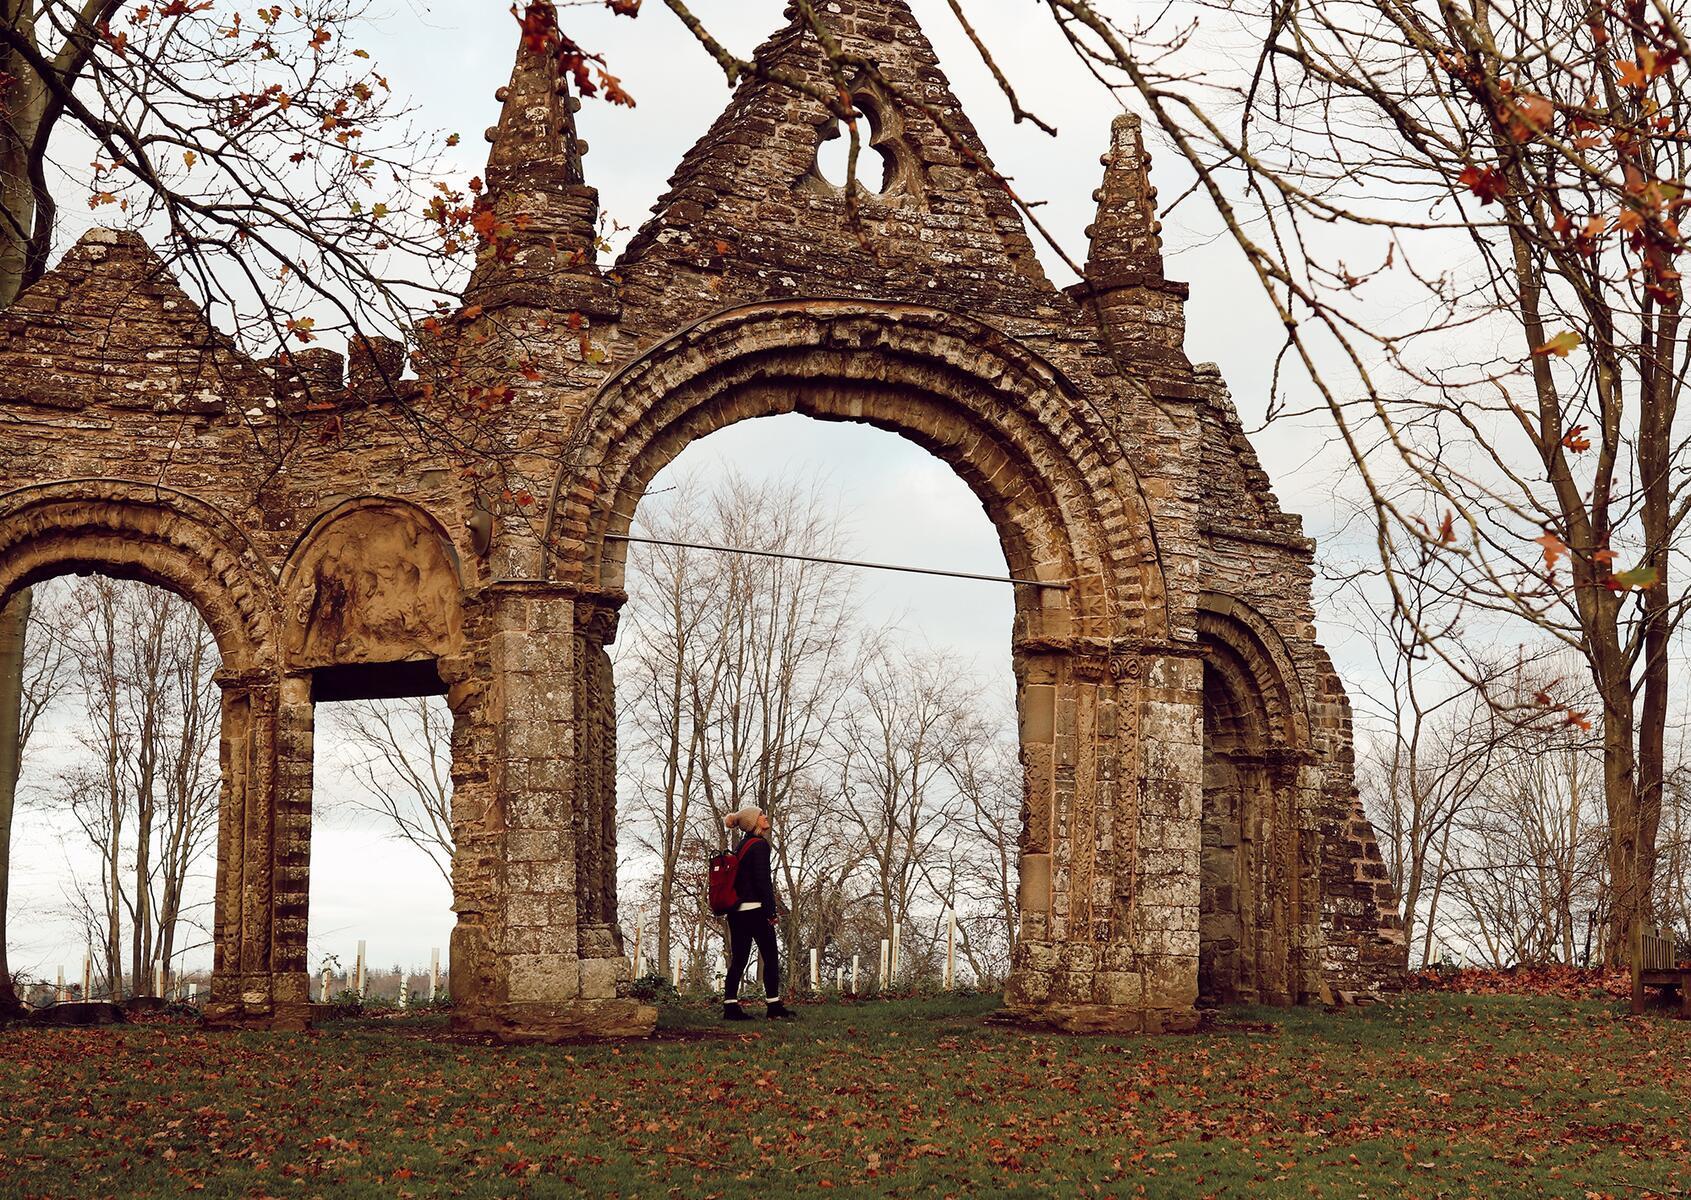 View of the stone ruins Shobdon Arches